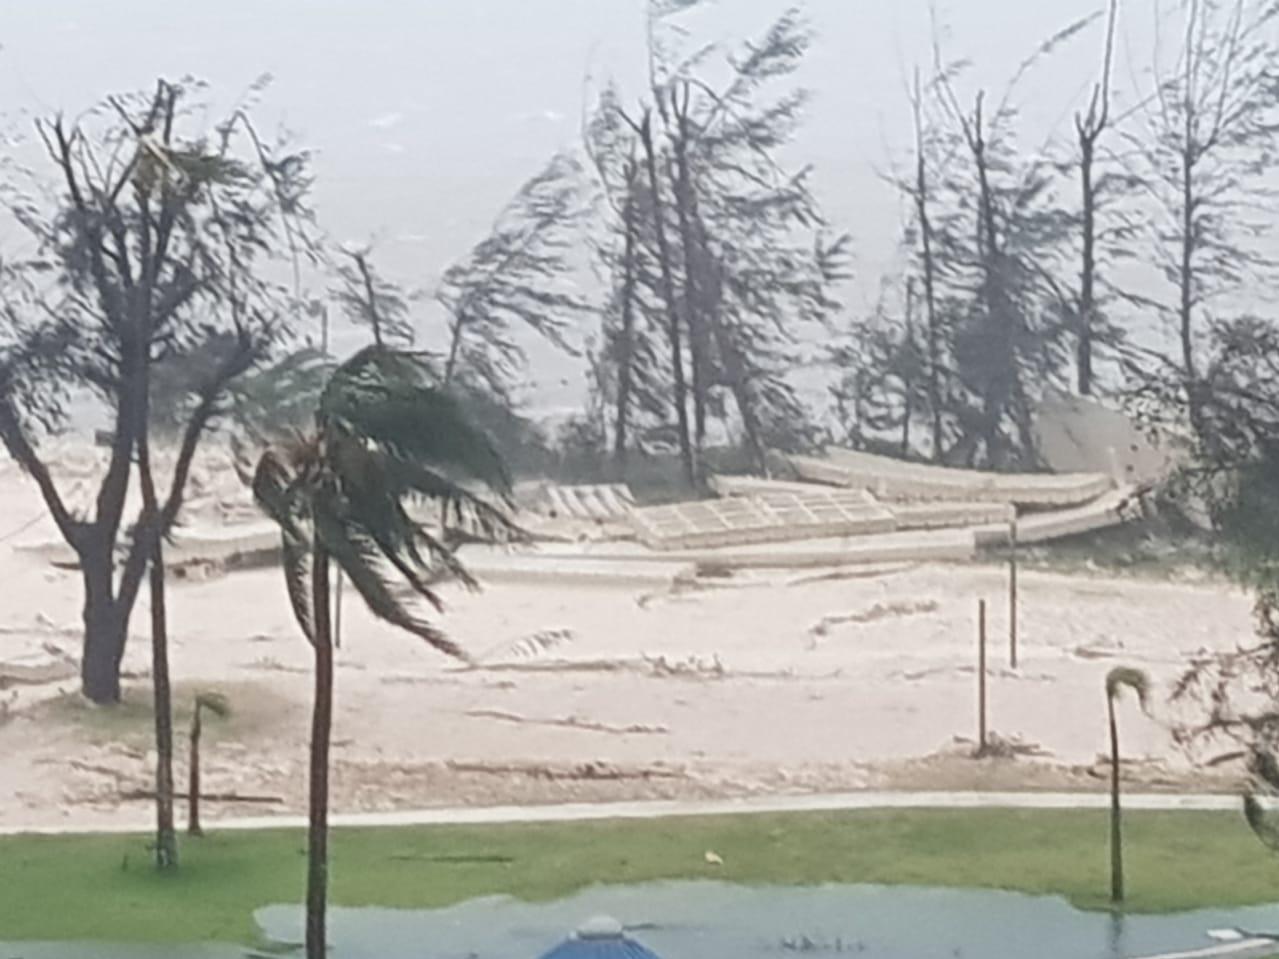 Damage at the Fiesta Resort on Saipan